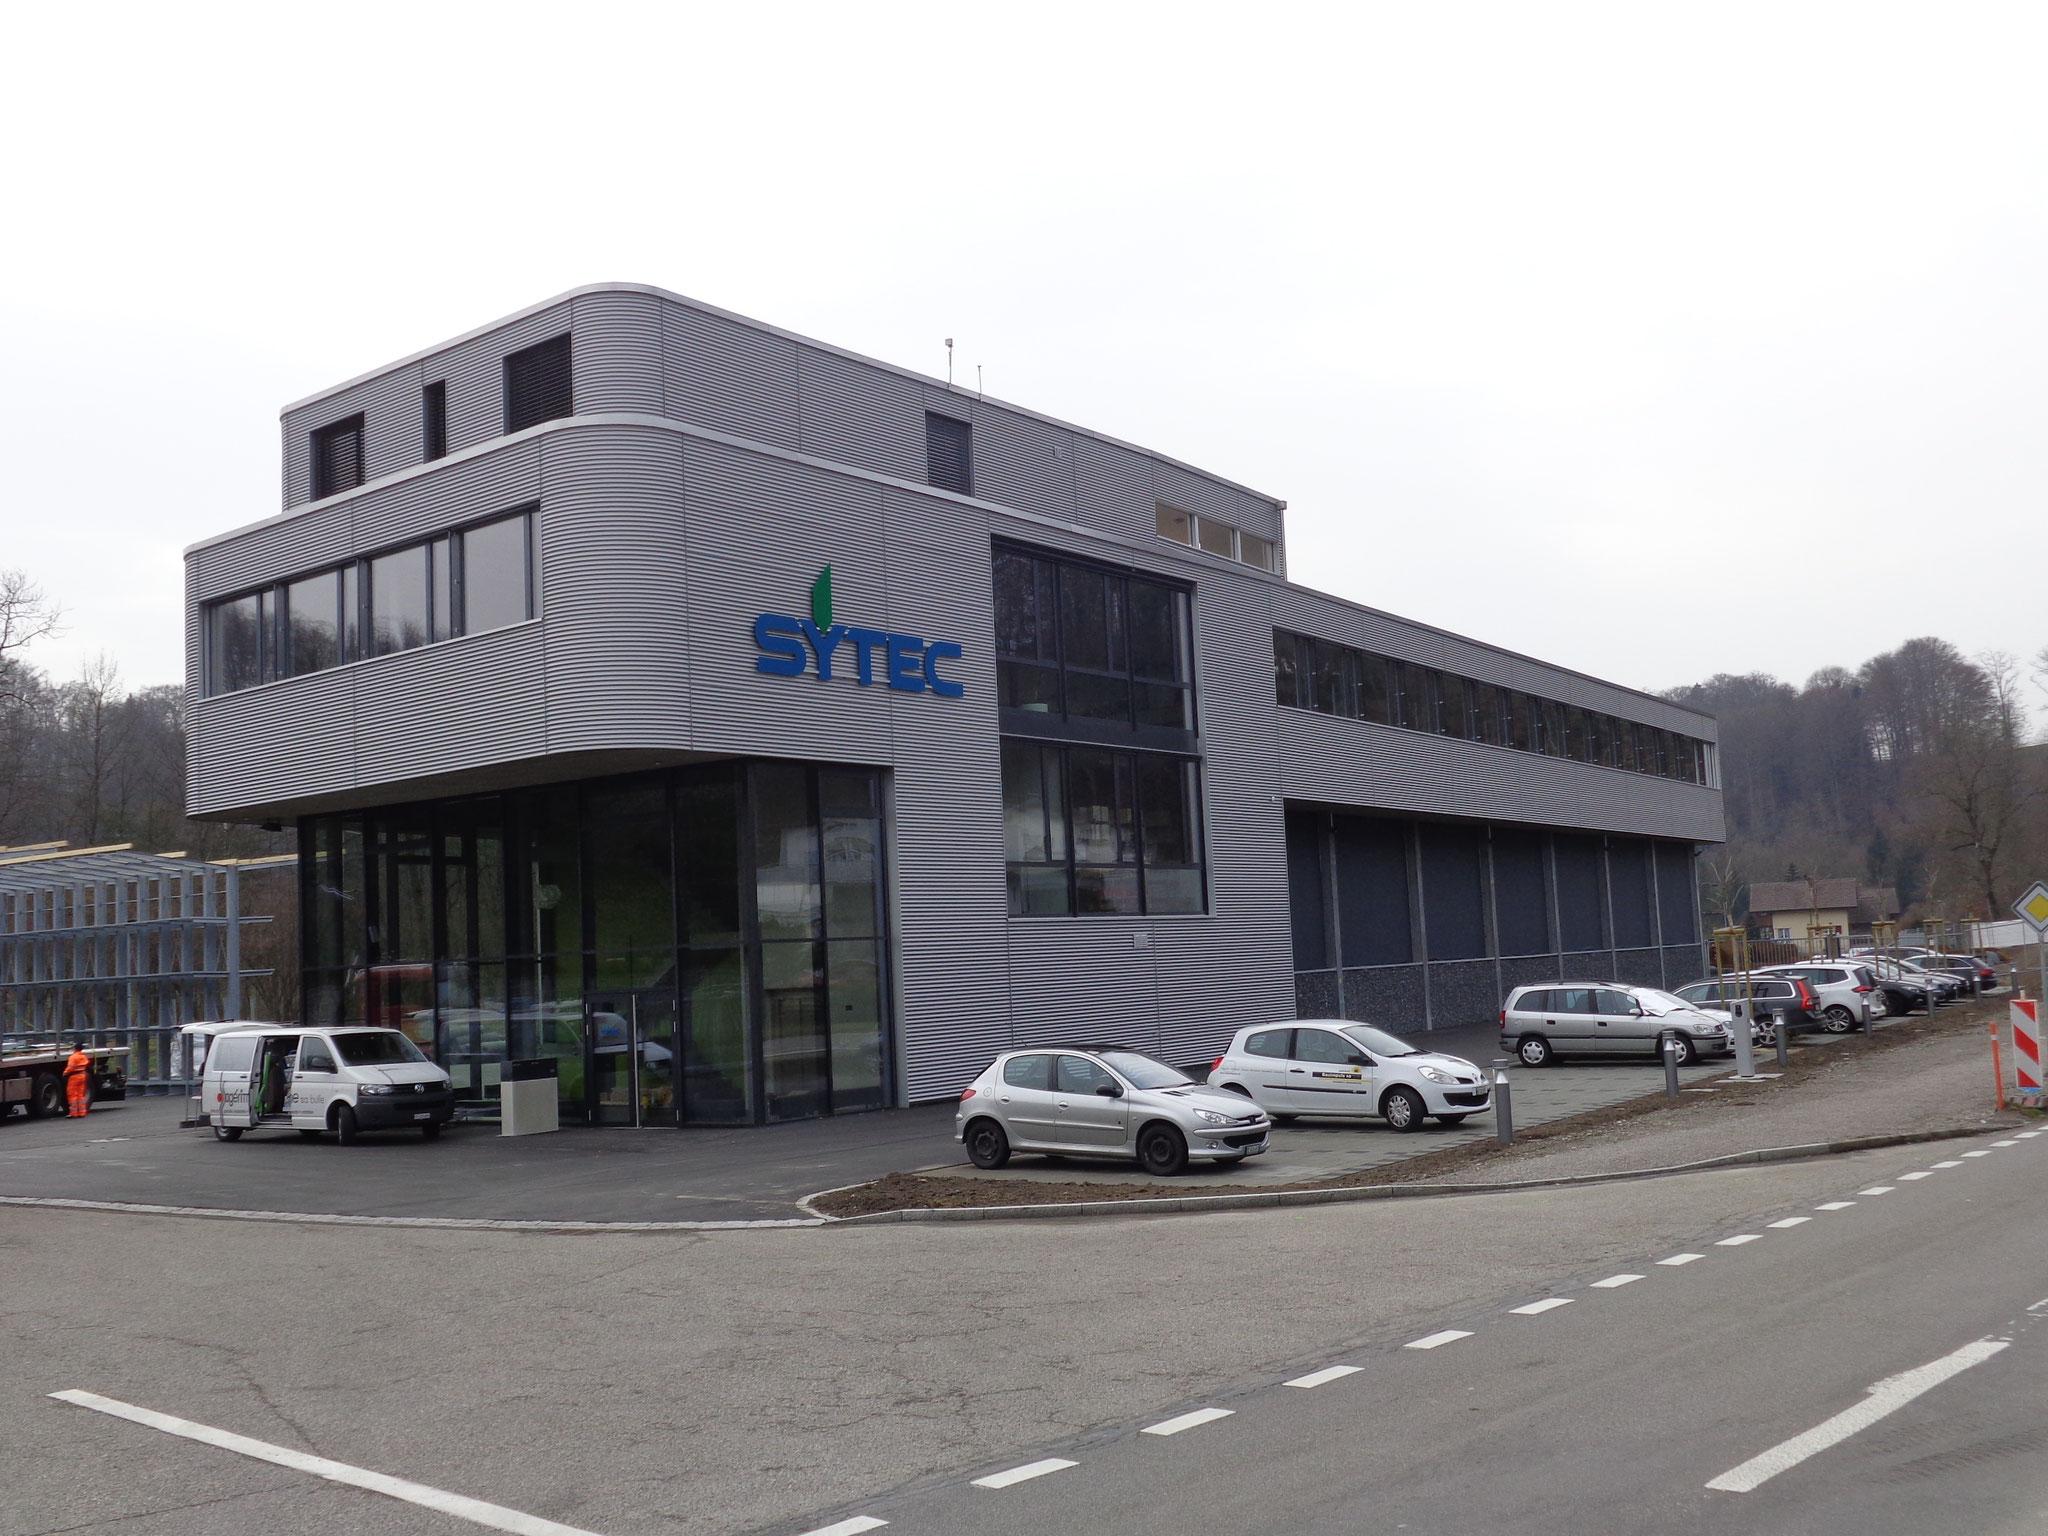 Laupenstrasse, Neuenegg